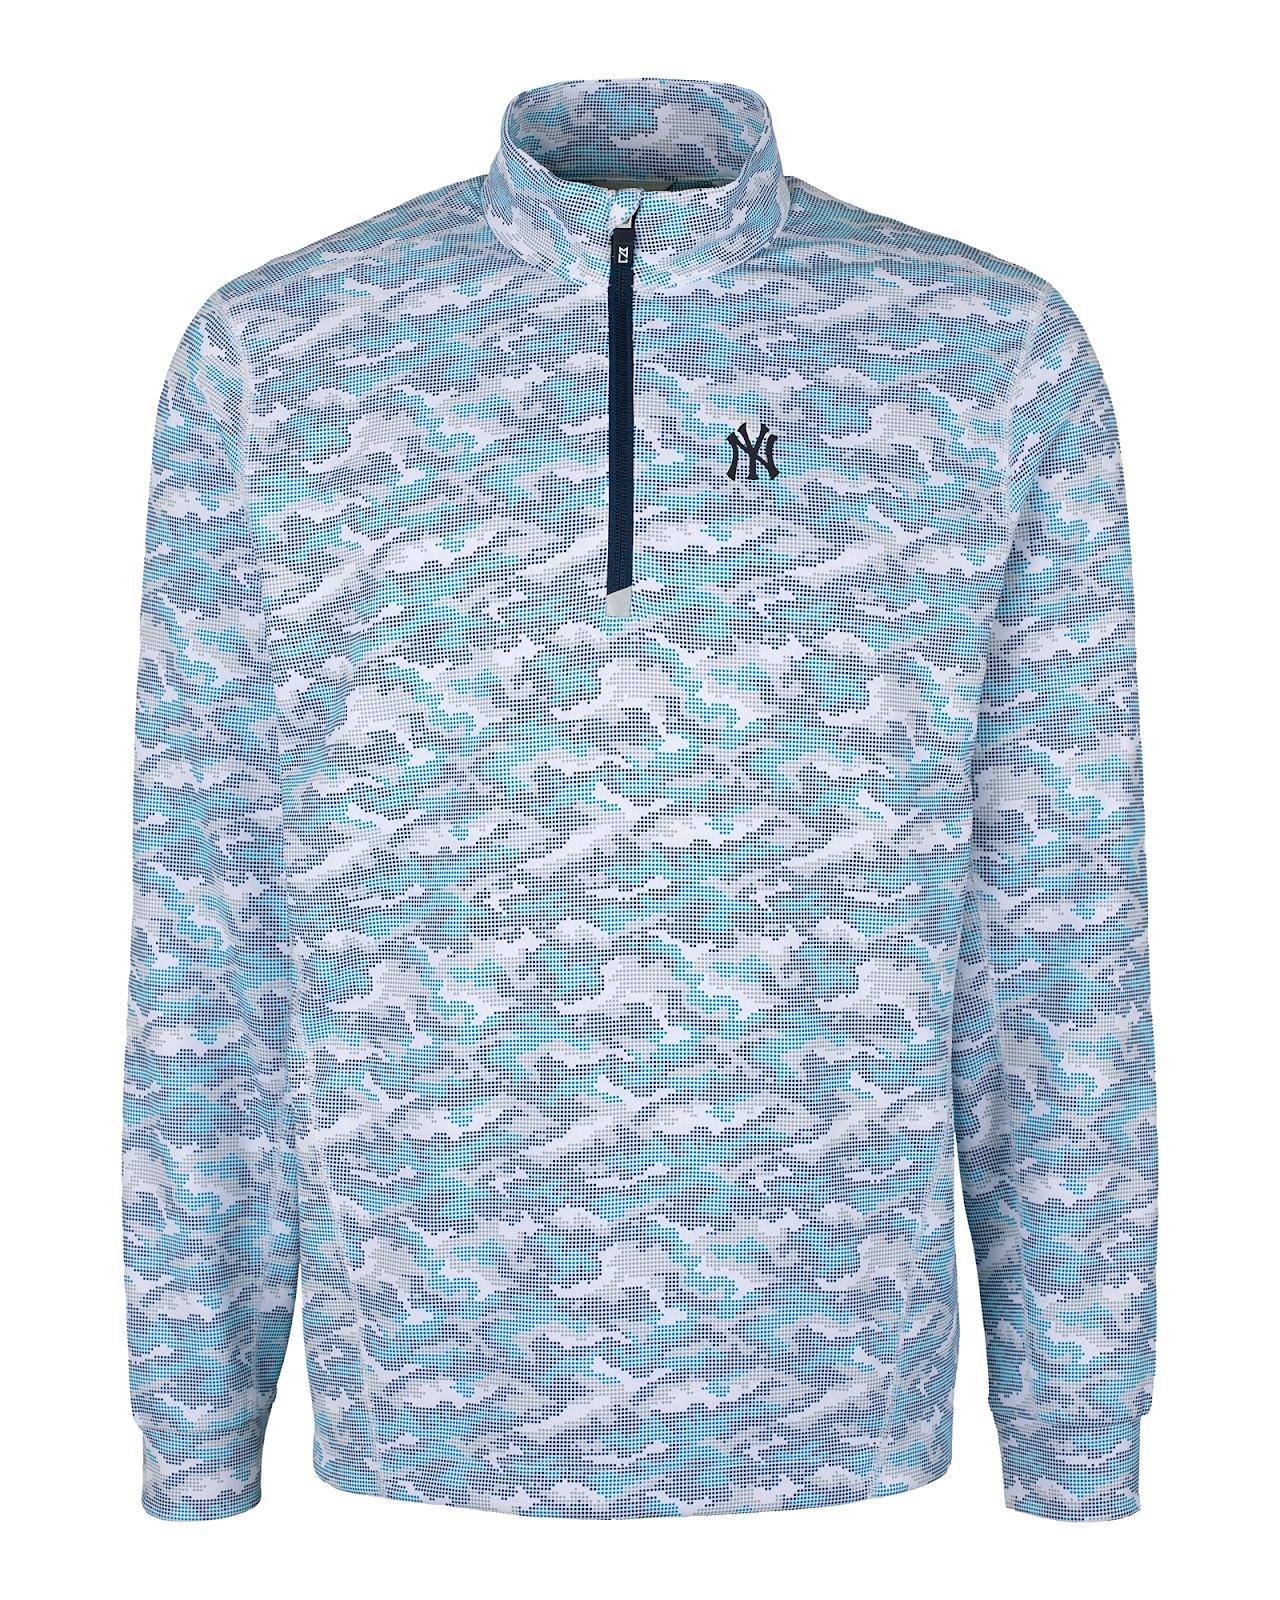 Cutter and Buck Men's New York Yankees Traverse Camo Print Half-Zip Jacket